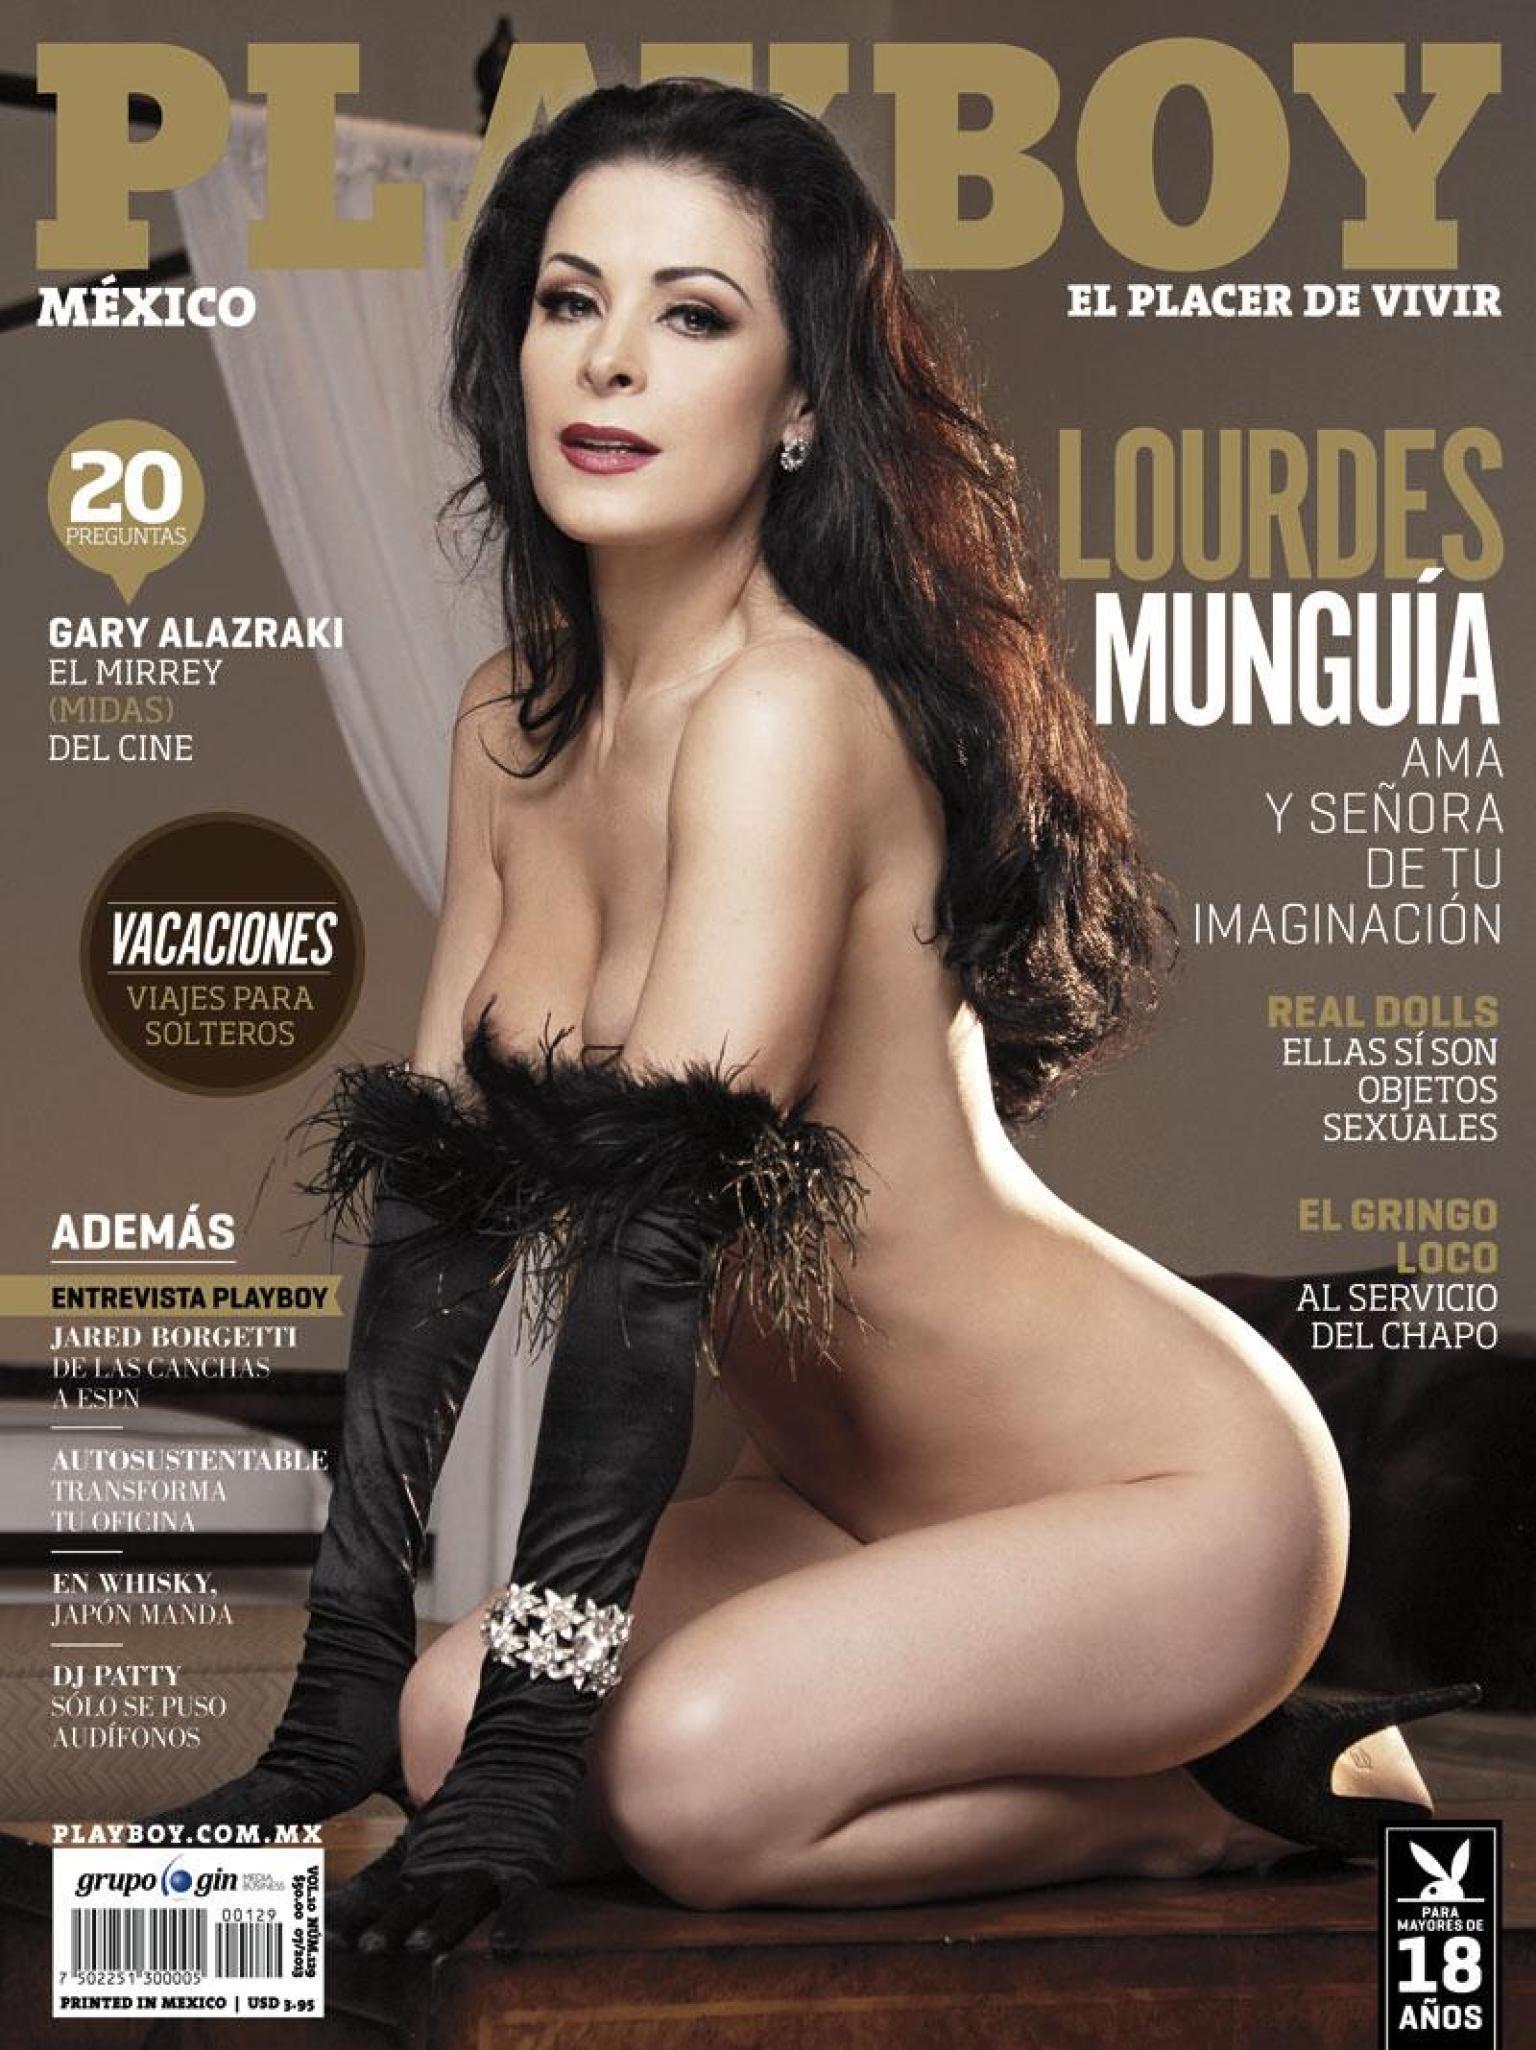 revista ana maria sexo adulto